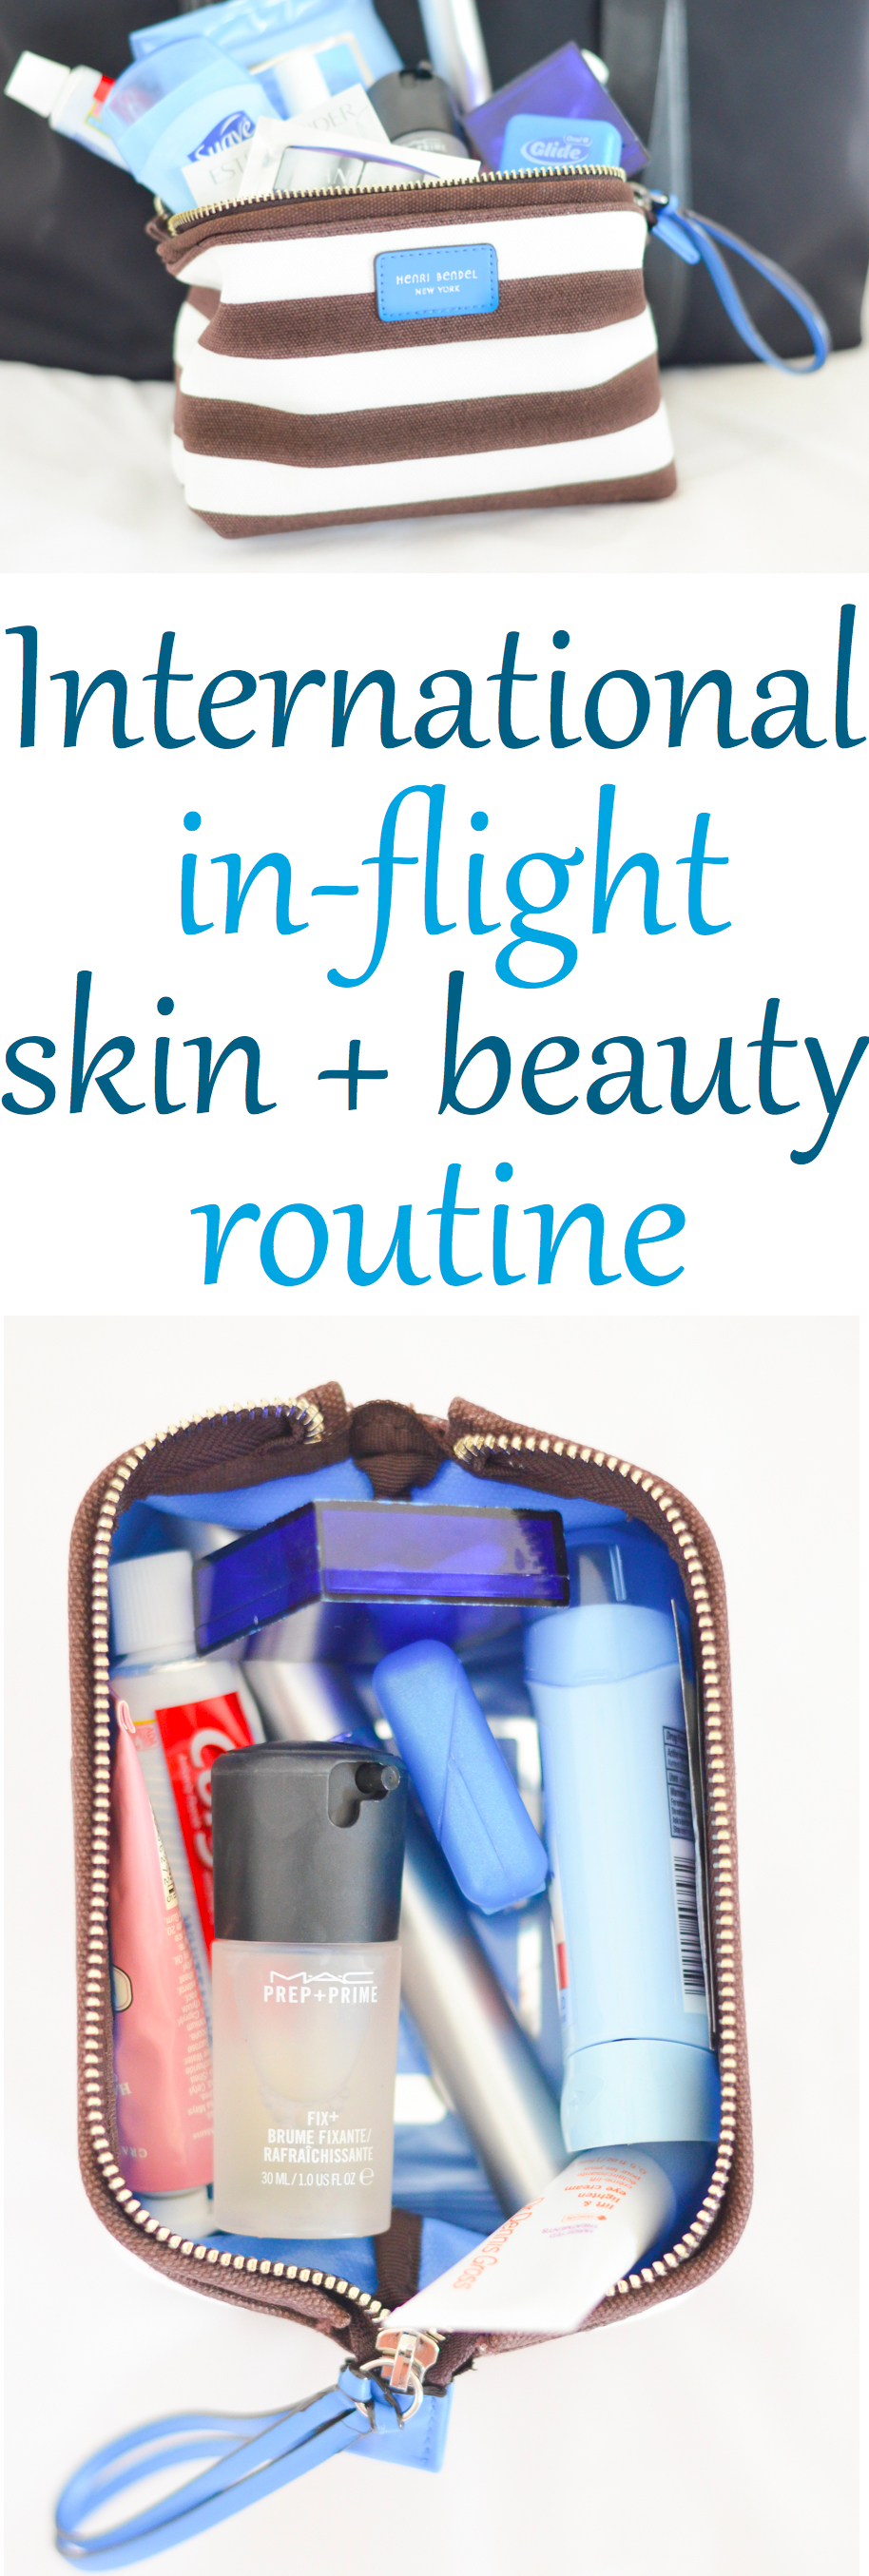 International Plane Travel Skin + Beauty Care - What to Pack in your makeup bag. #trael #traveltips #skincare #internationaltravel